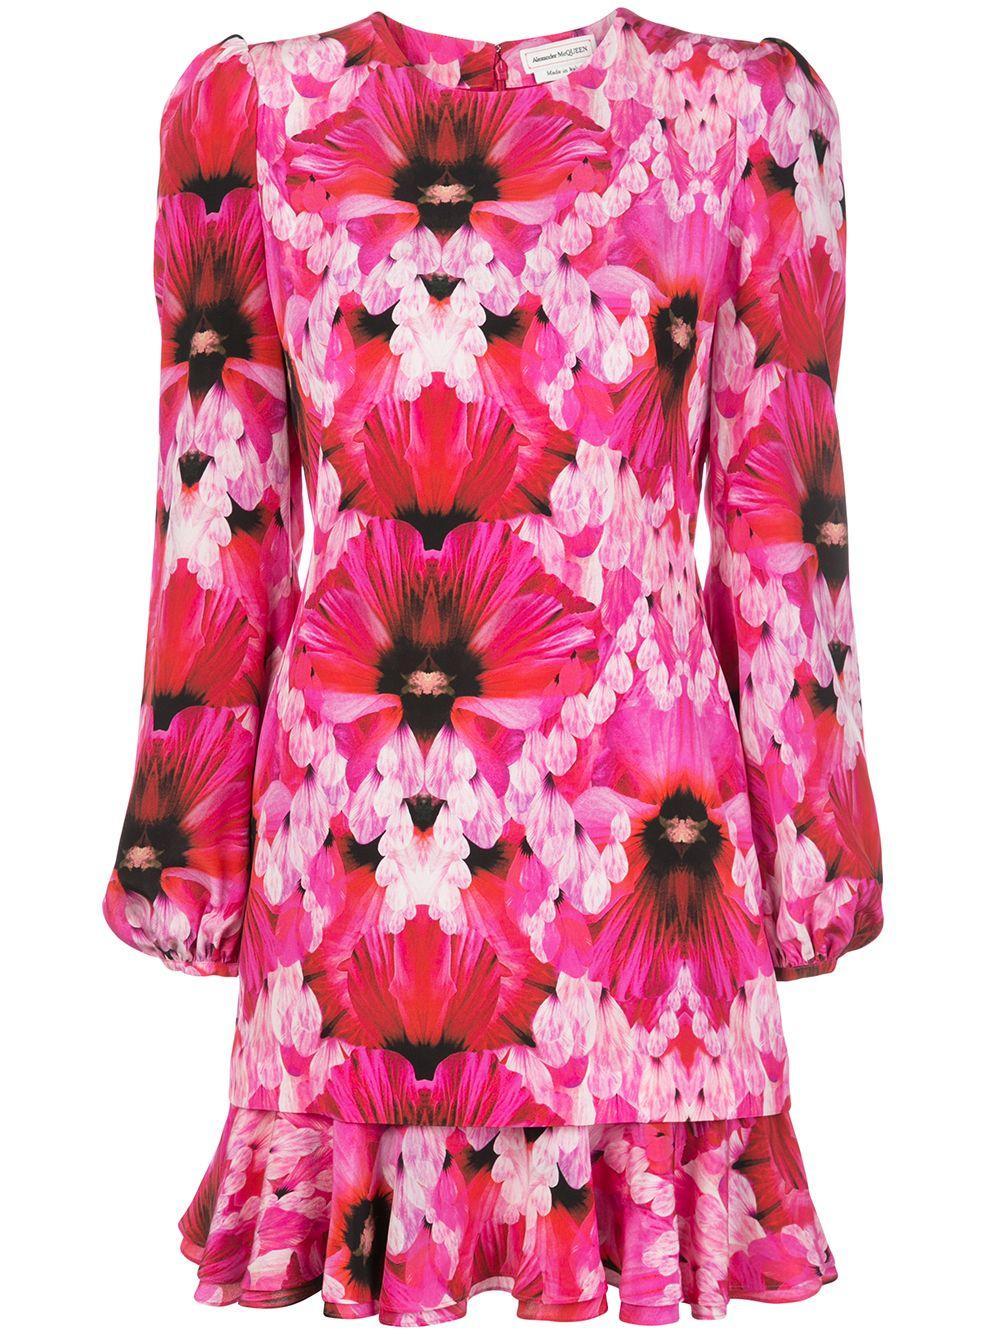 Long Sleeve Floral Print Ruffle Hem Chemise